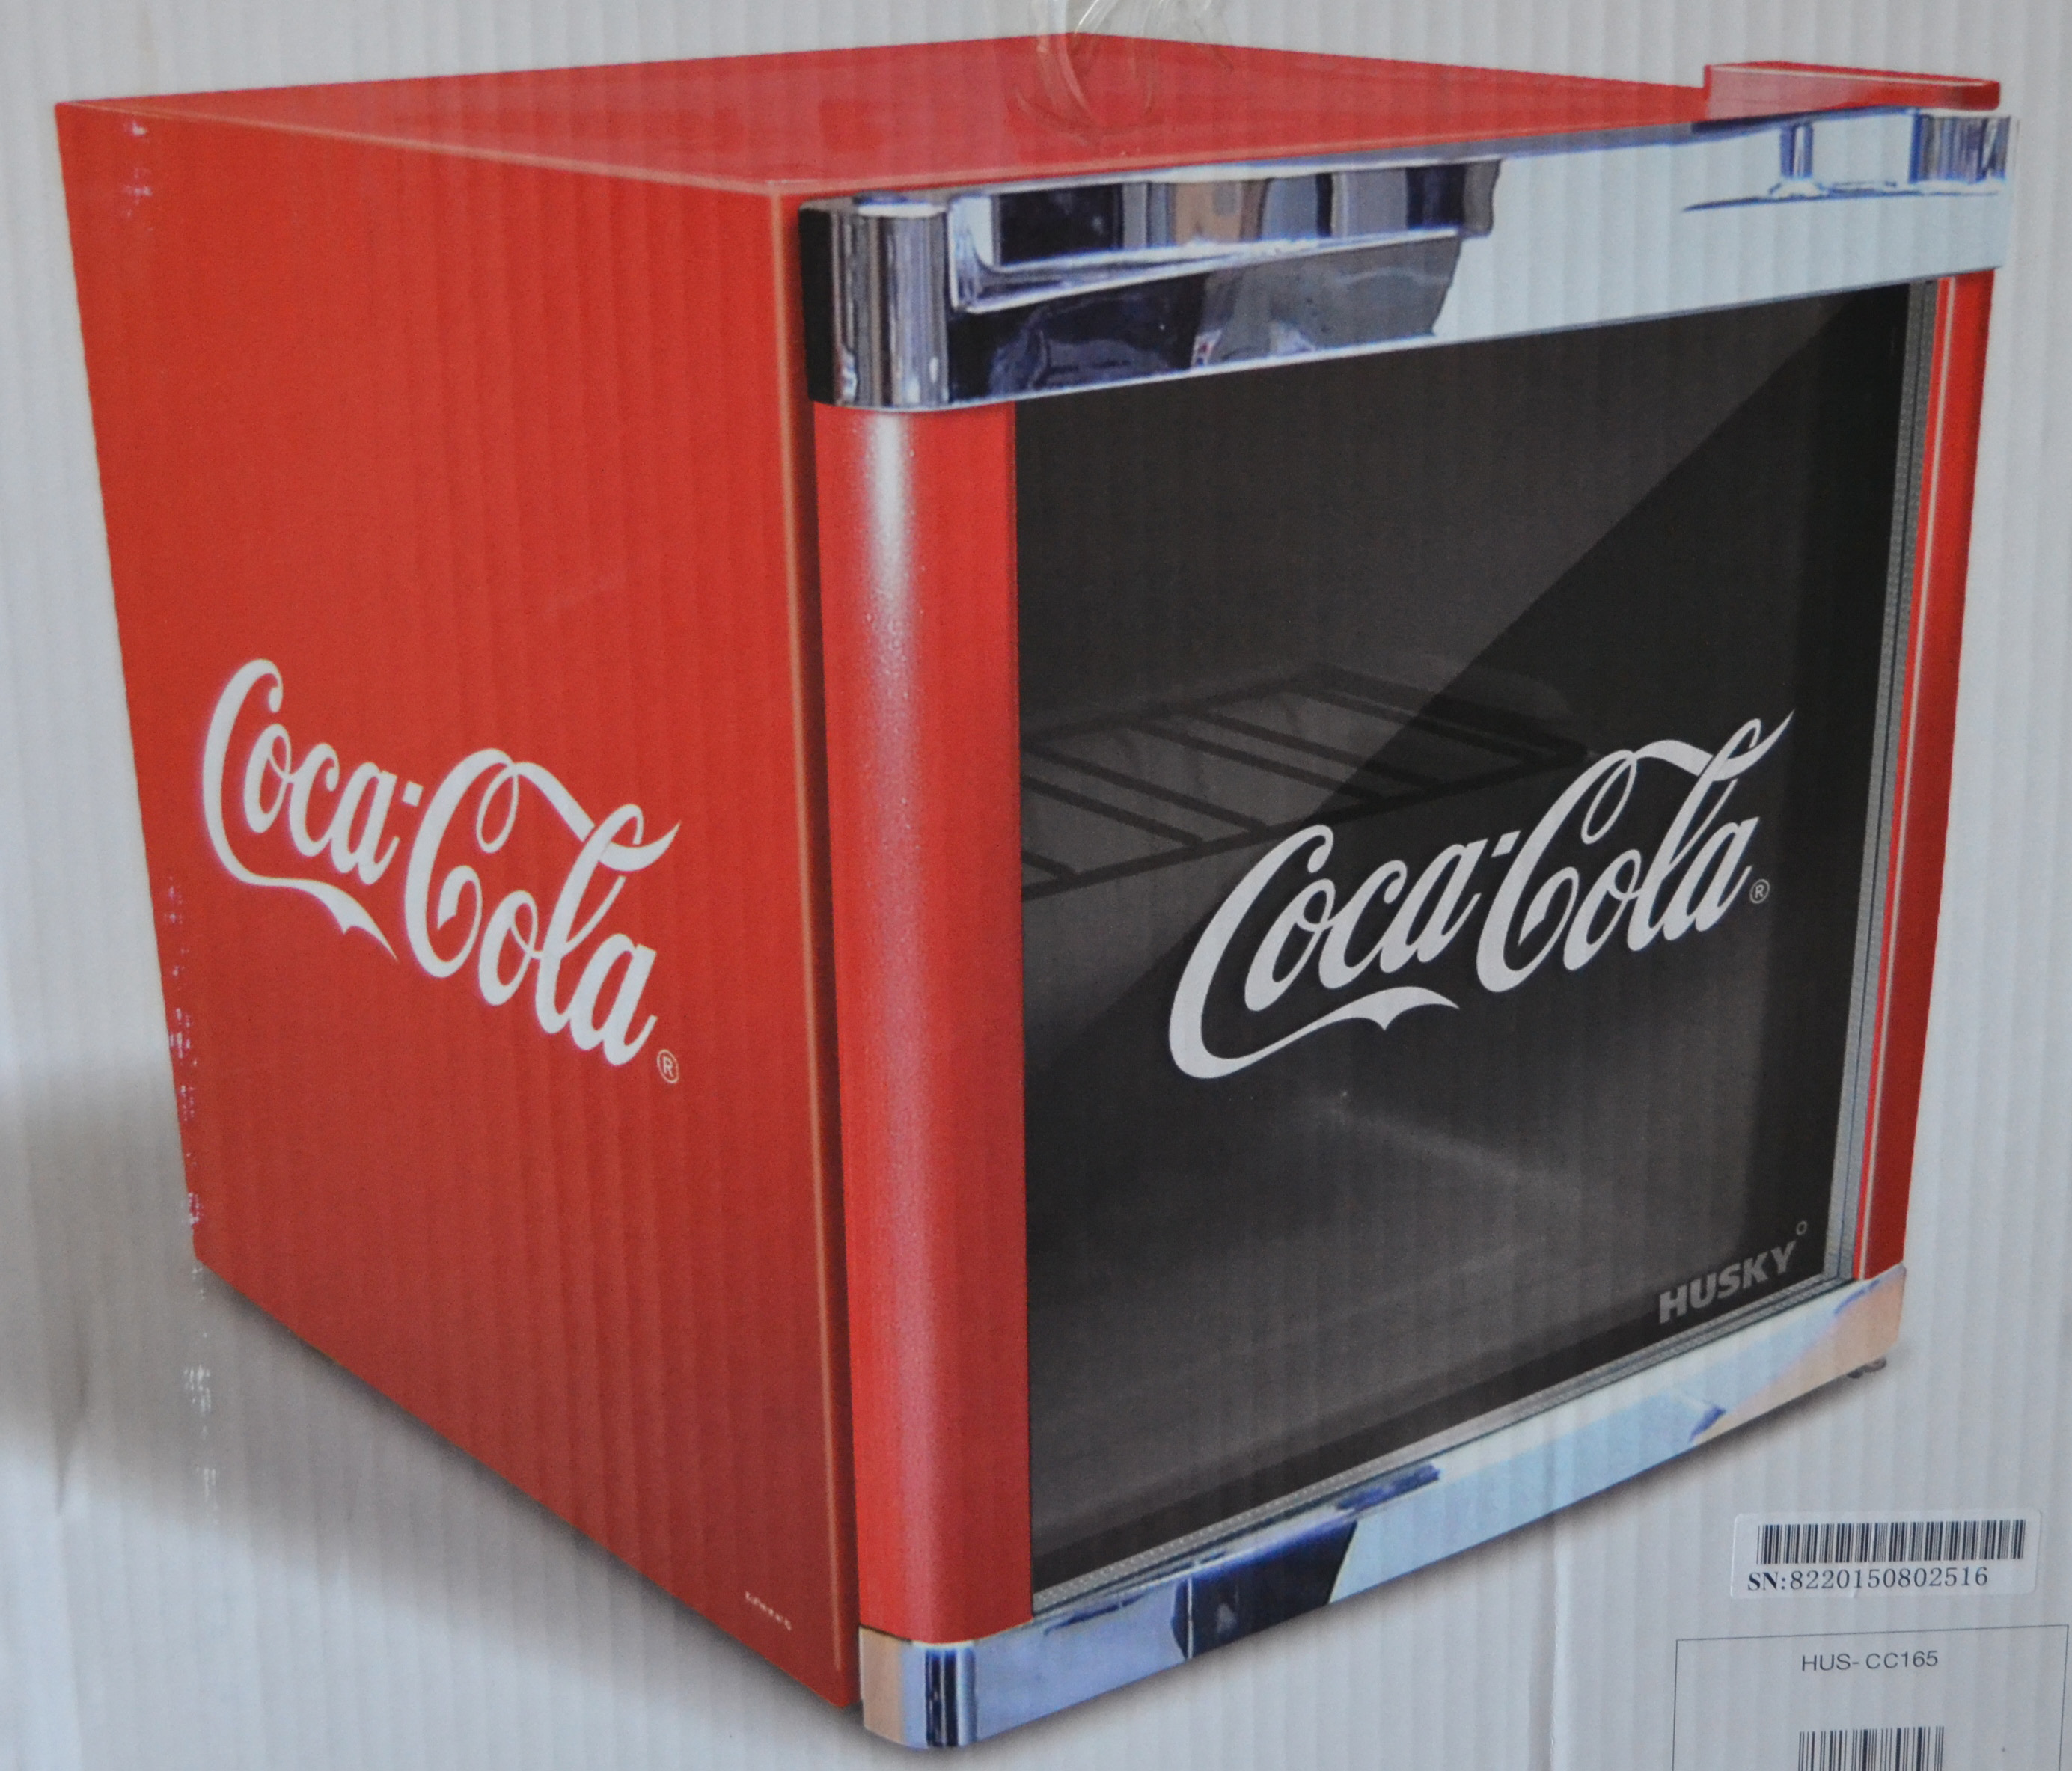 husky coolcube cool cube k hlschrank coca cola design neu b ware bholur ebay. Black Bedroom Furniture Sets. Home Design Ideas